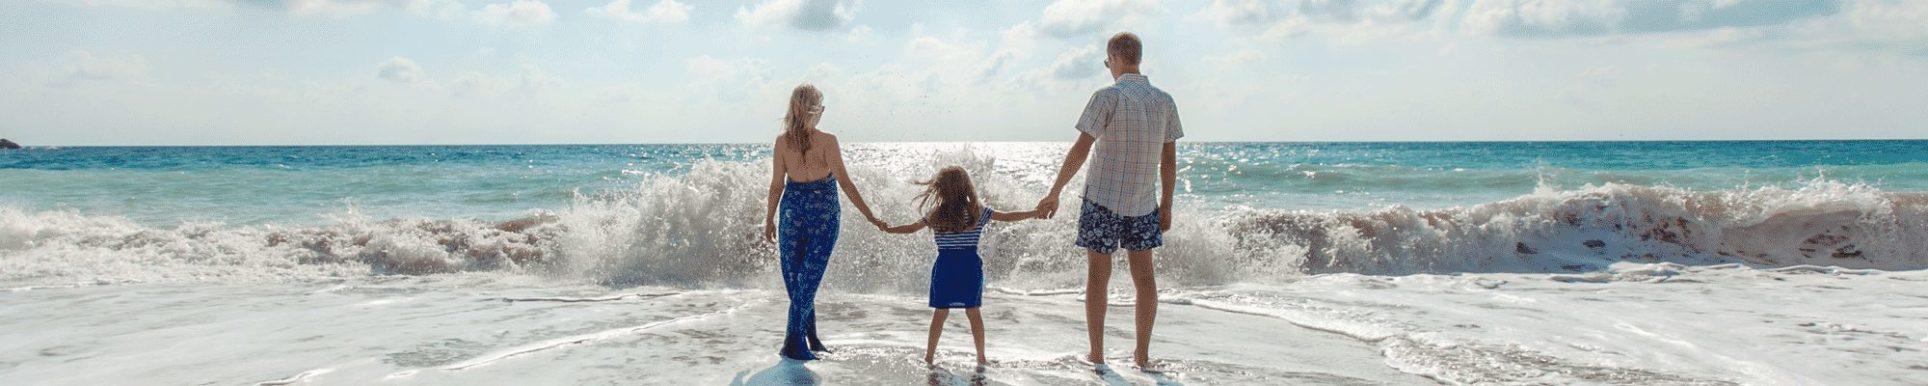 Beach Family 2000x400